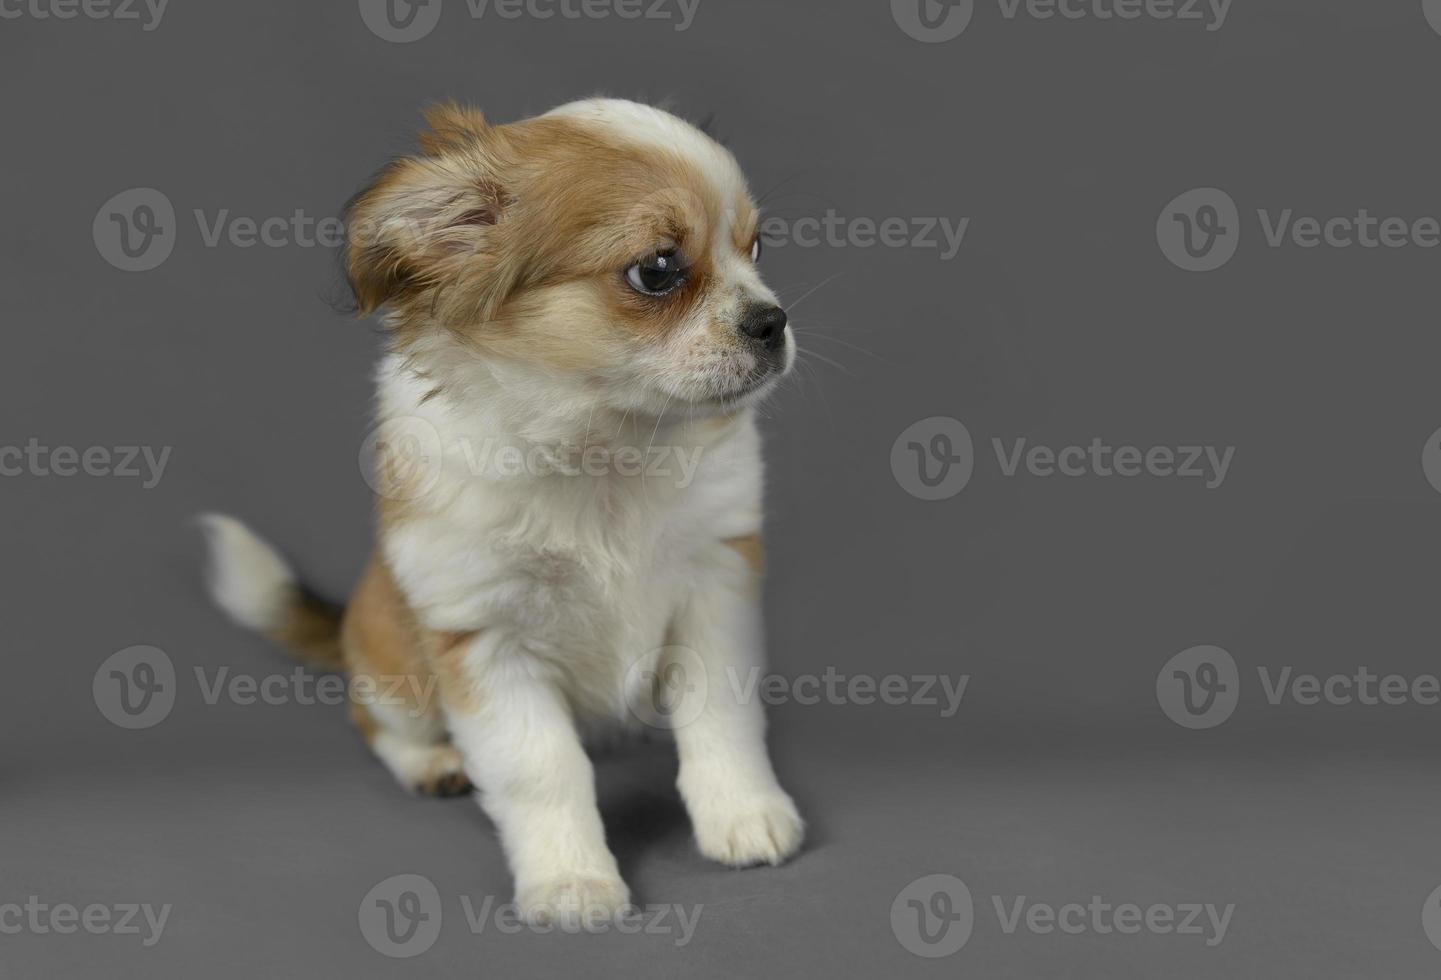 schattig zuiver ras chihuahua pup foto